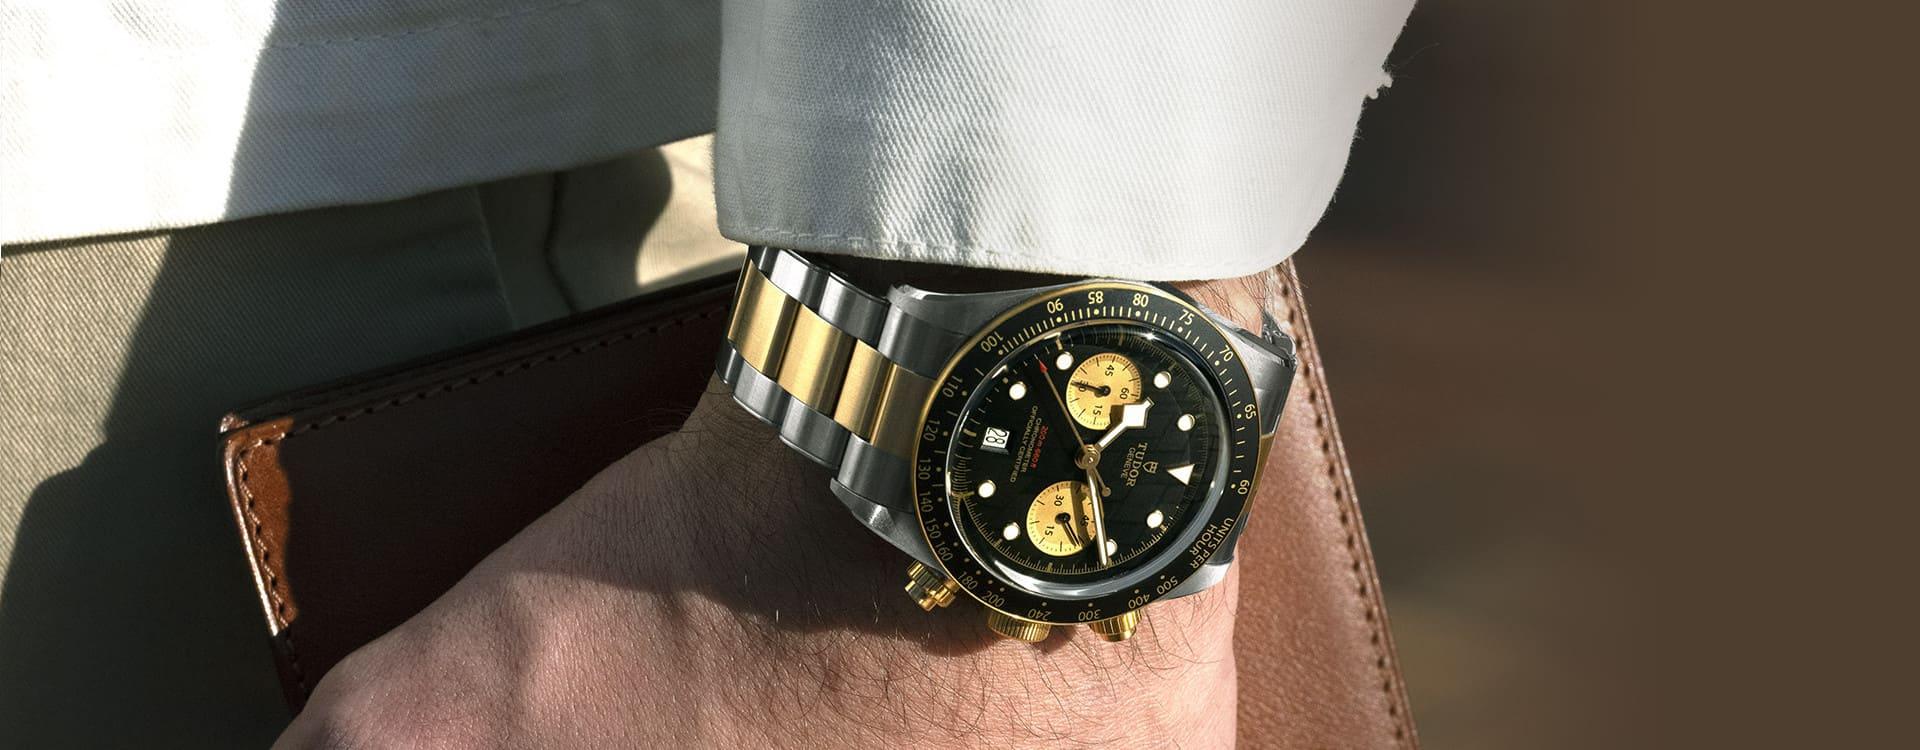 TUDOR Black Bay Chrono Uhren